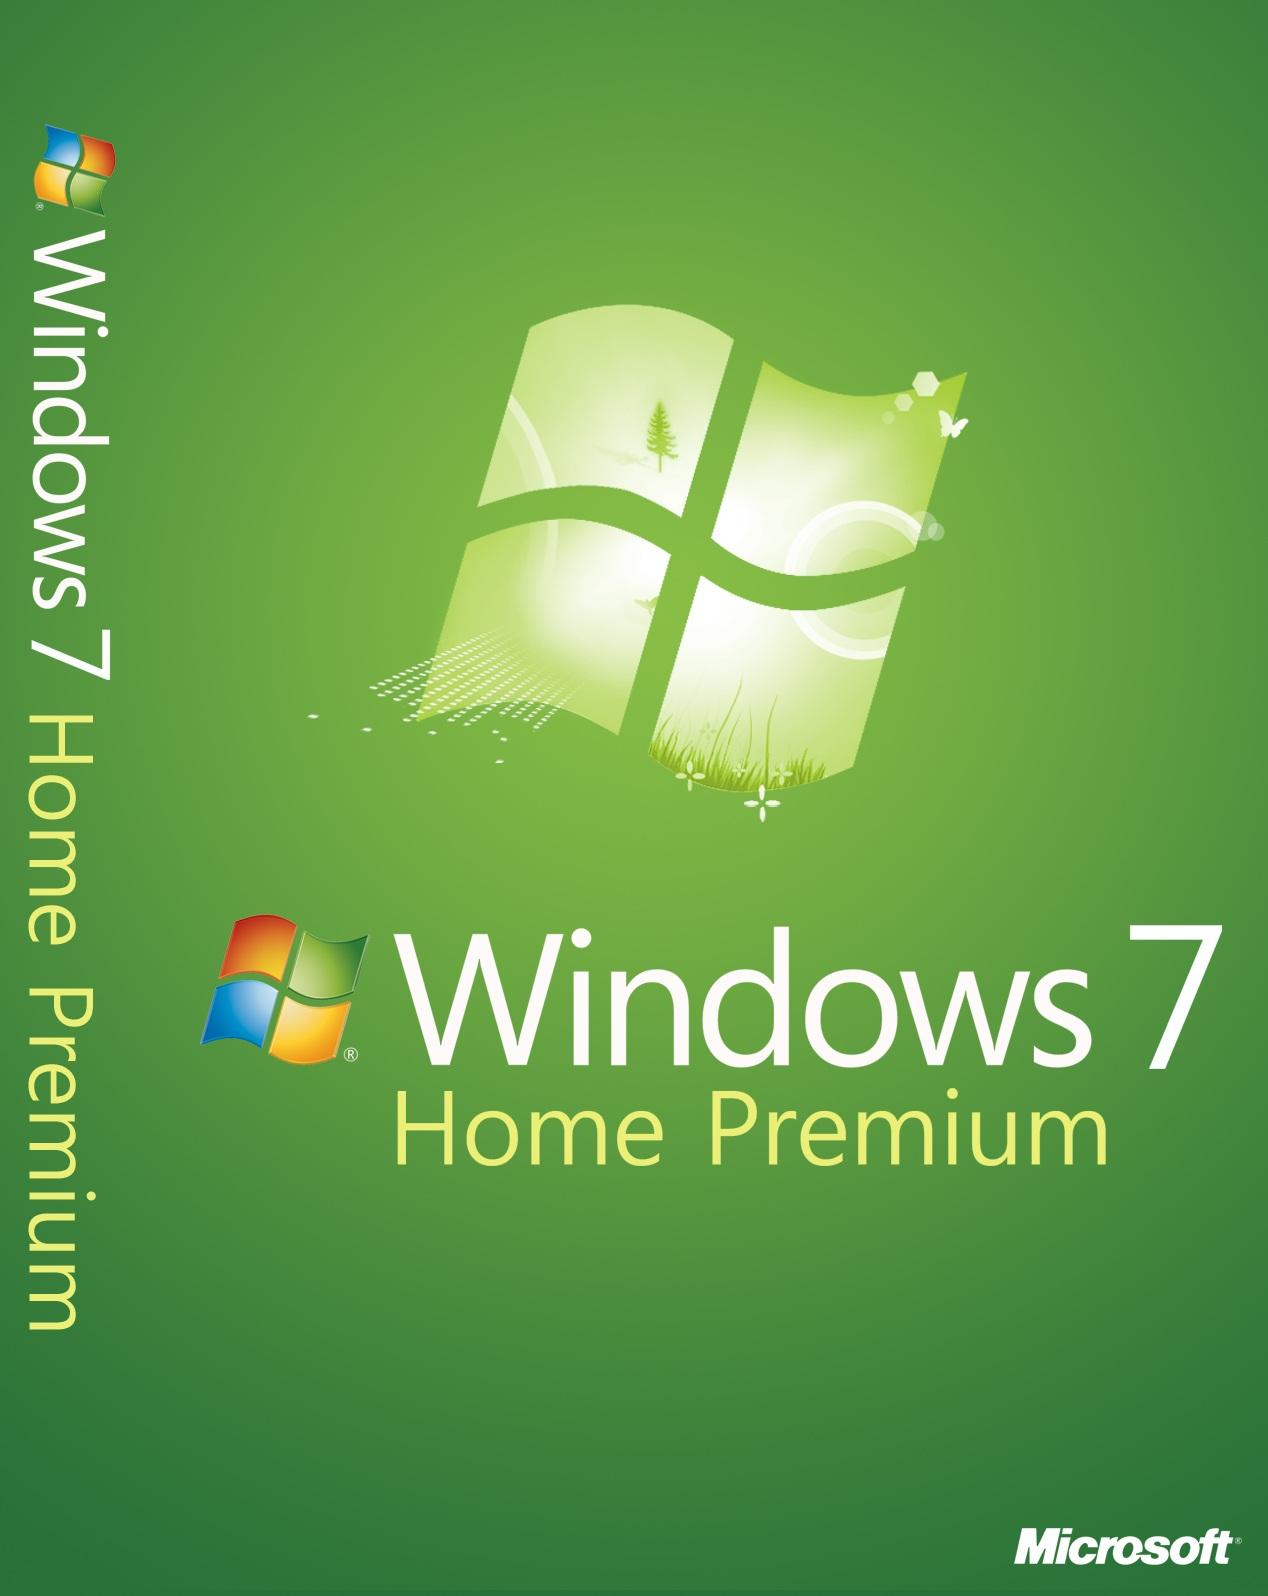 windows 7 edition home premium